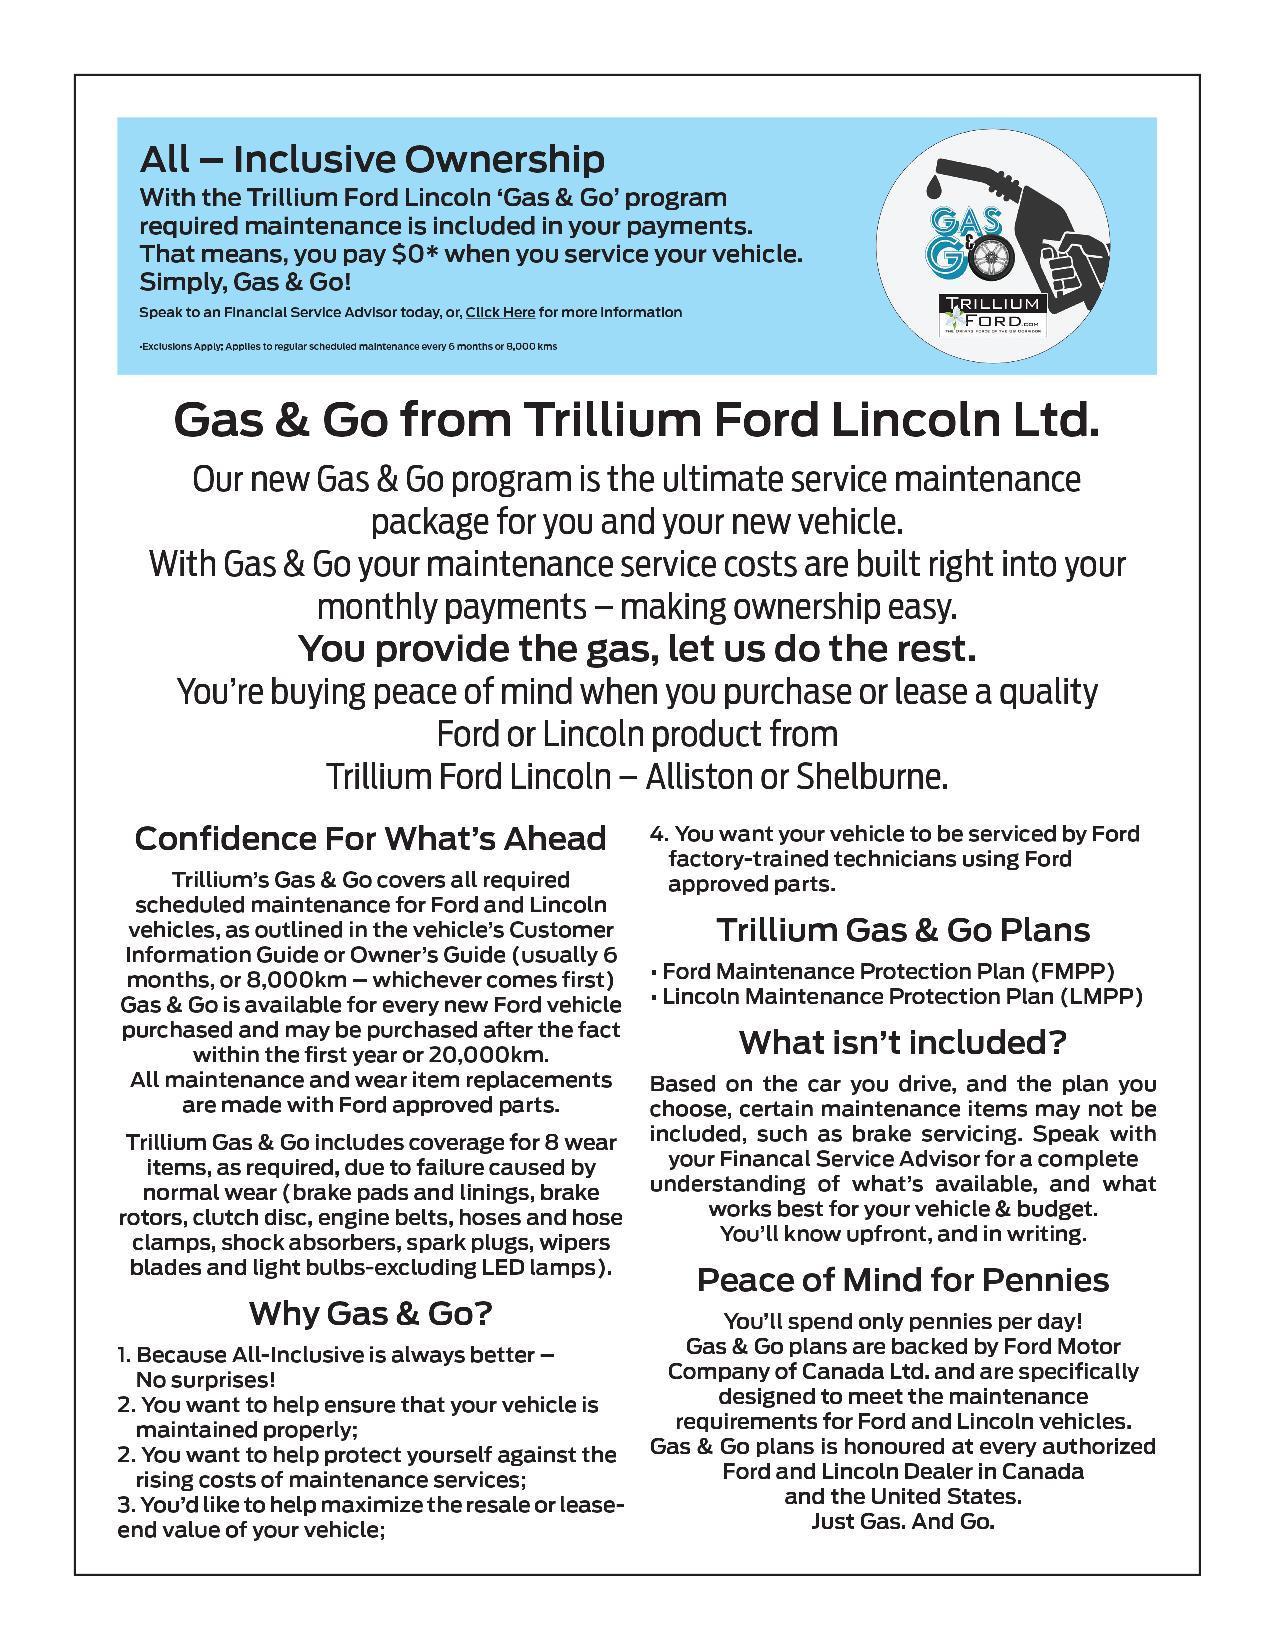 Trillium Ford Gas & Go program details